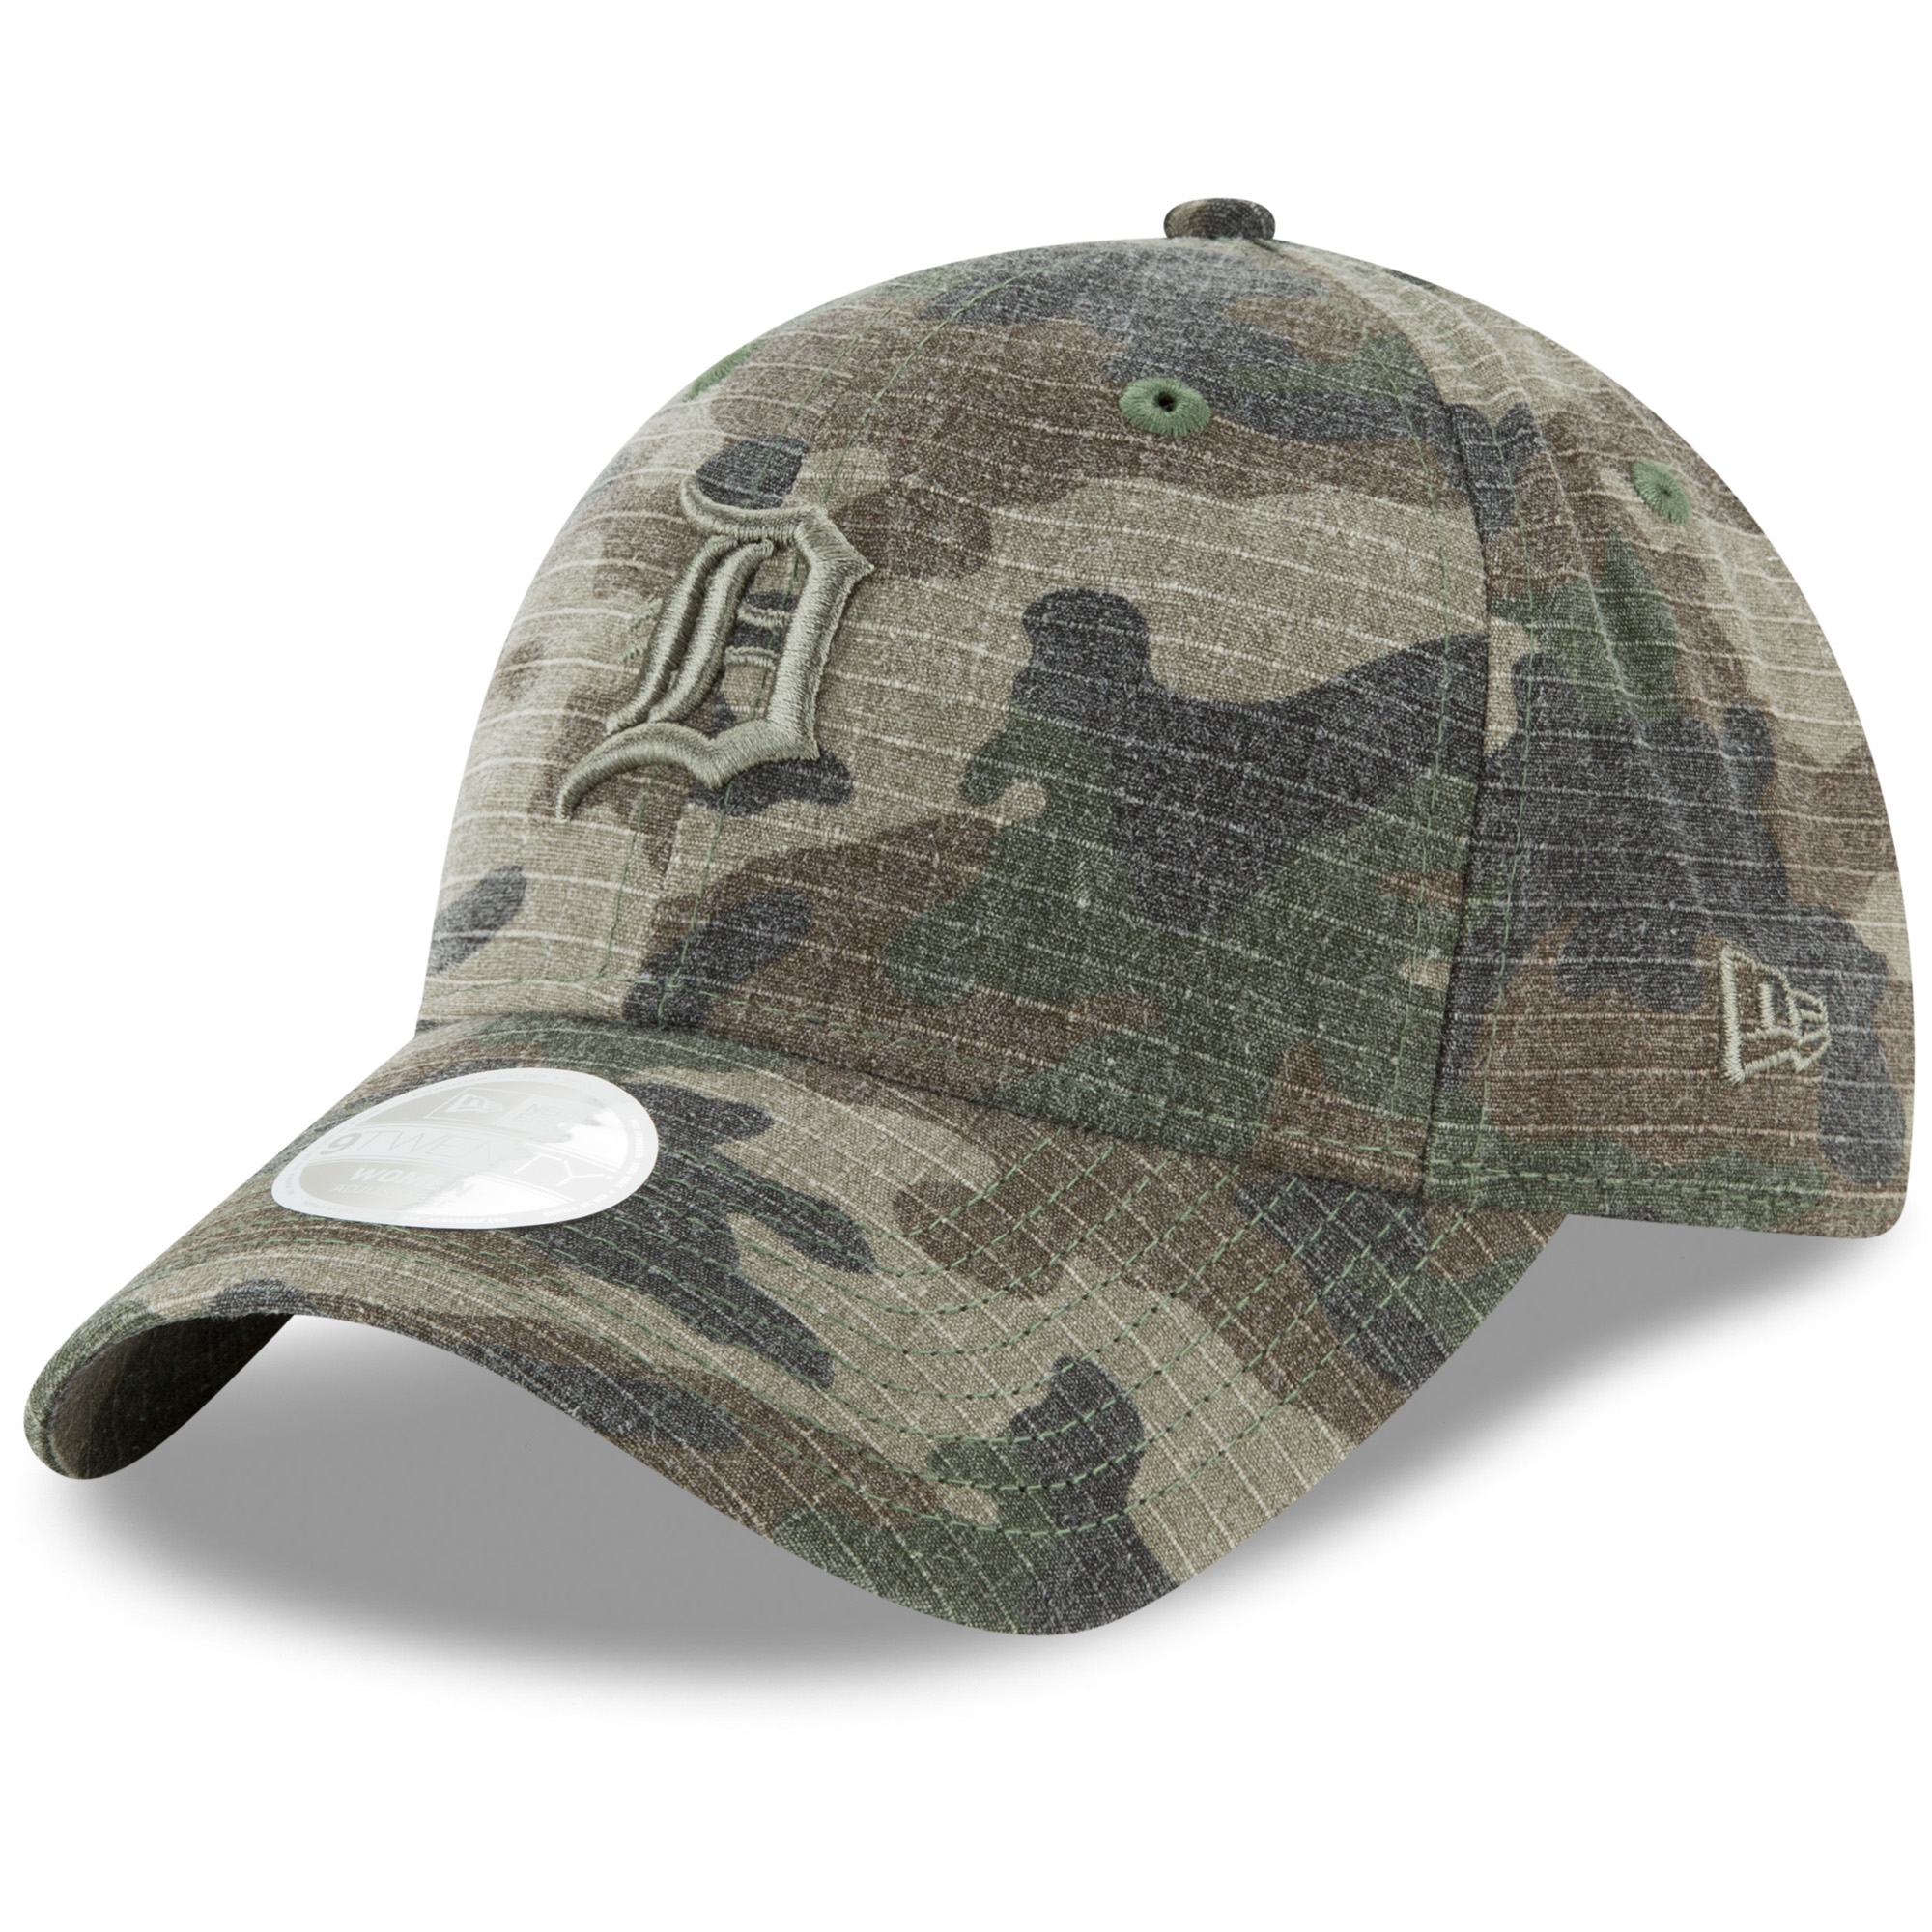 Detroit Tigers New Era Women's Tonal Core Classic 9TWENTY Adjustable Hat - Camo - OSFA